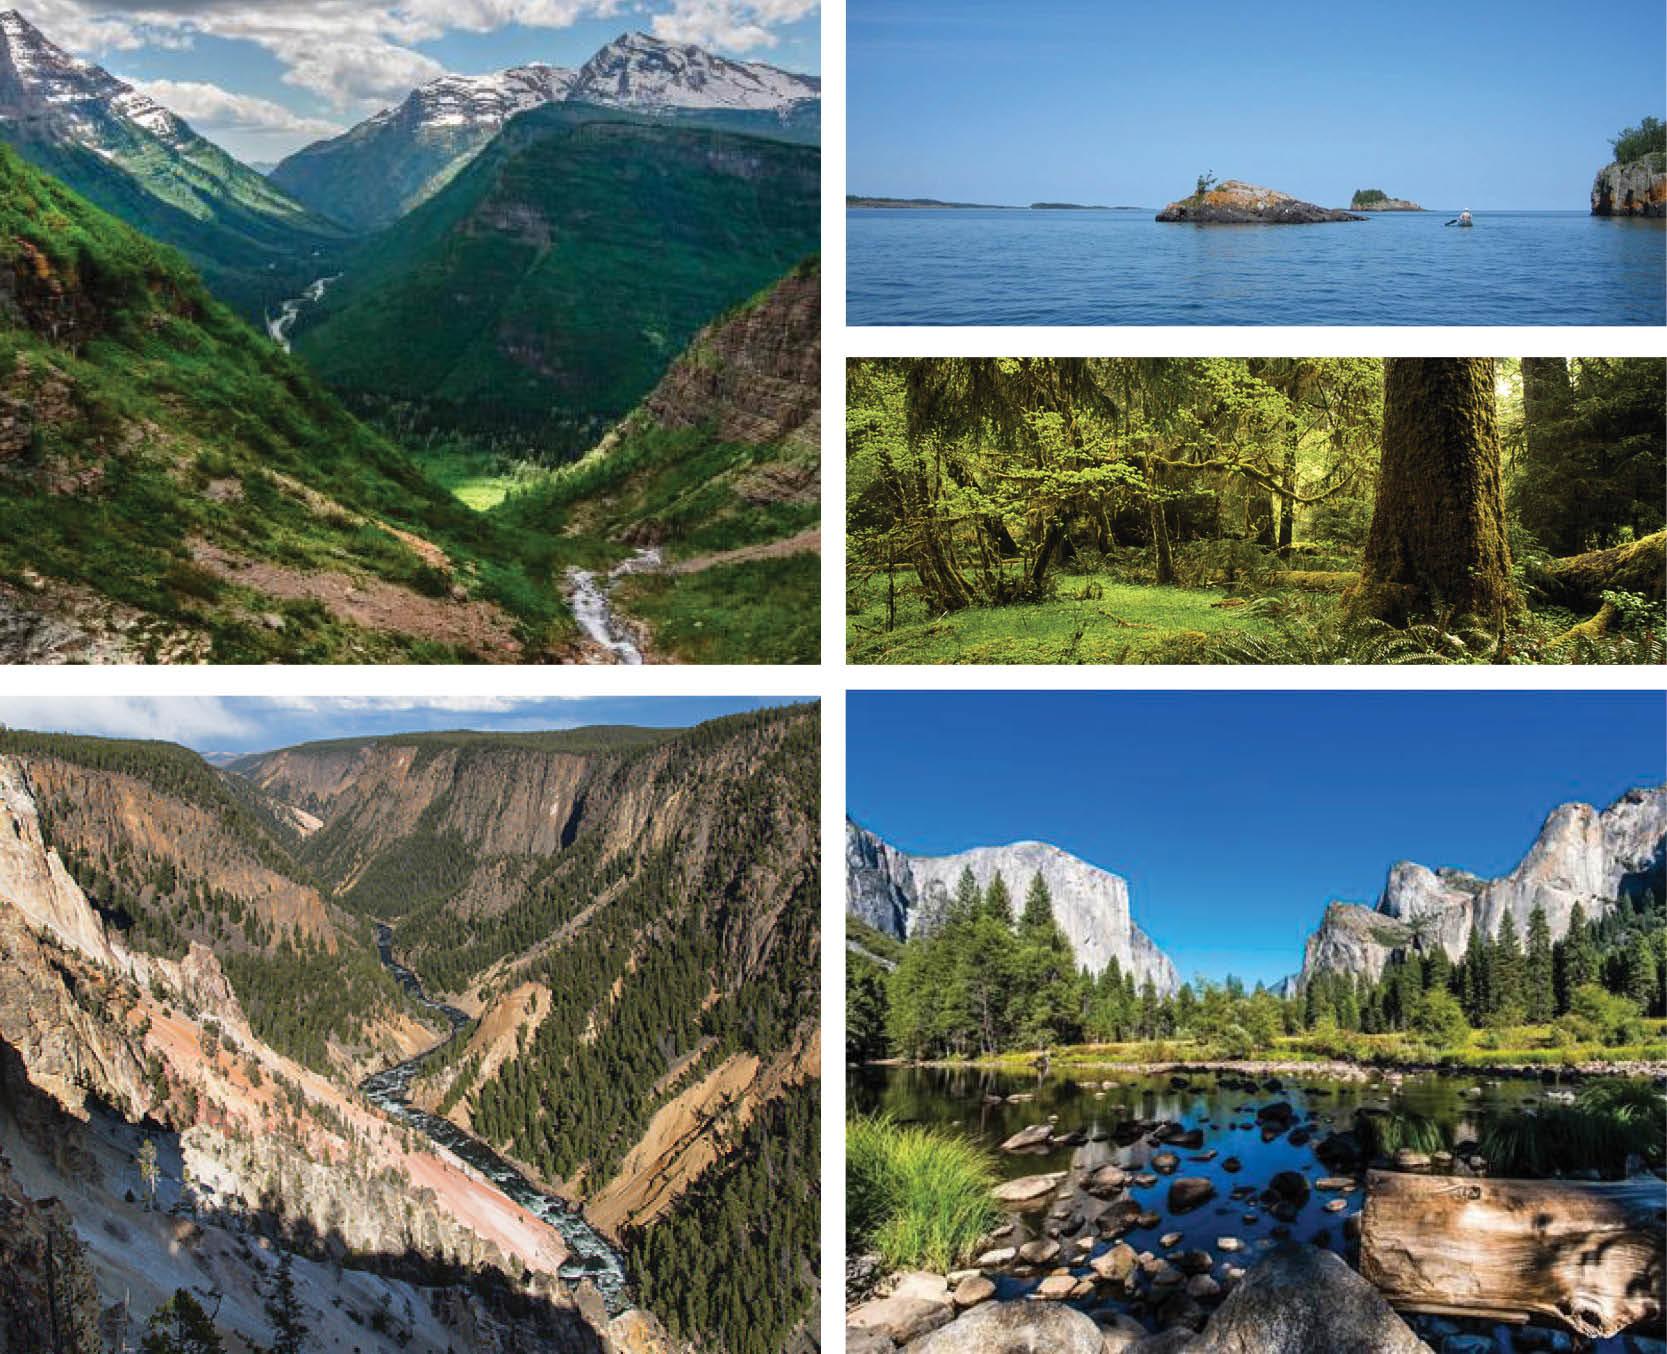 All photos  ©National Park Service